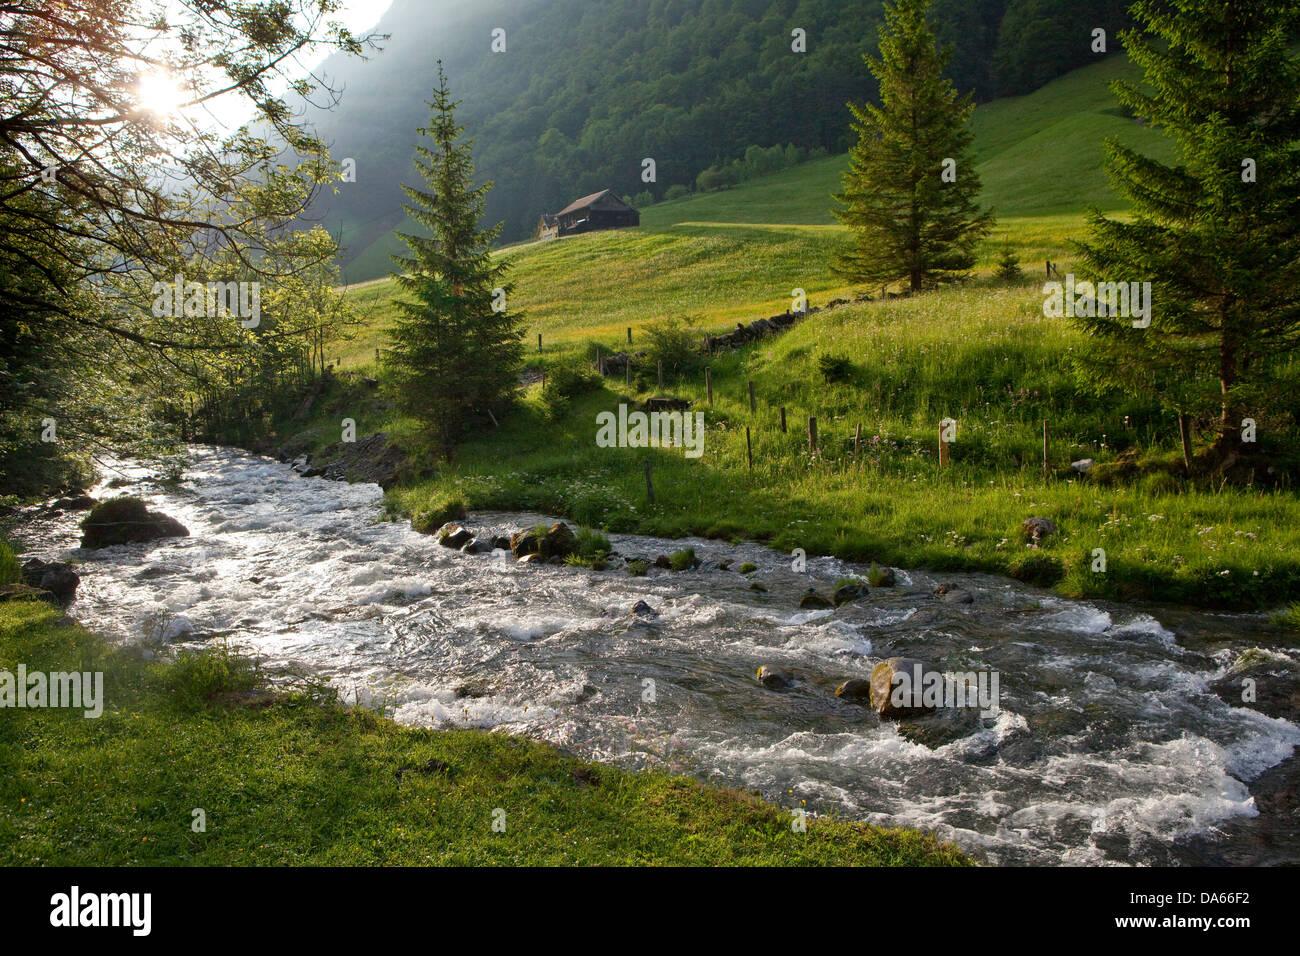 Brook Schwendi, water meadows, mountain, mountains, spring, canton, Appenzell, Innerroden, Appenzell area, Alpstein, - Stock Image